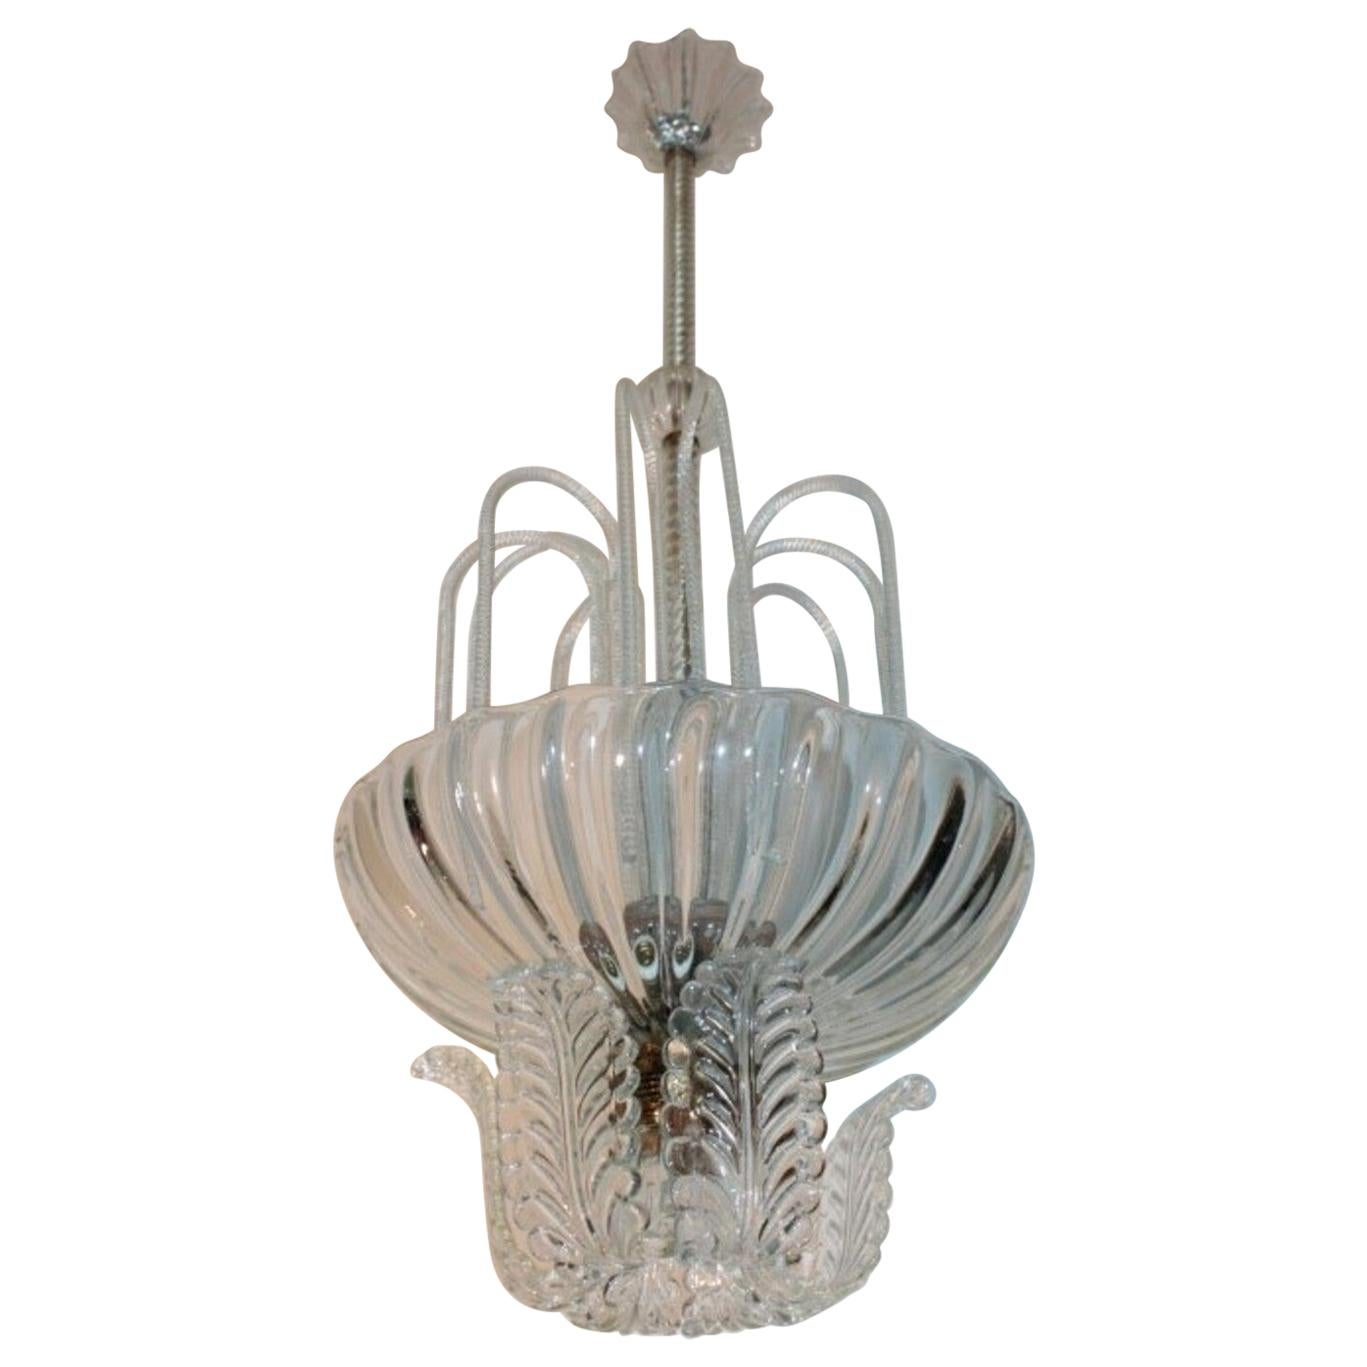 Ceiling Lamp 1940s Barovier & Toso Murano glass